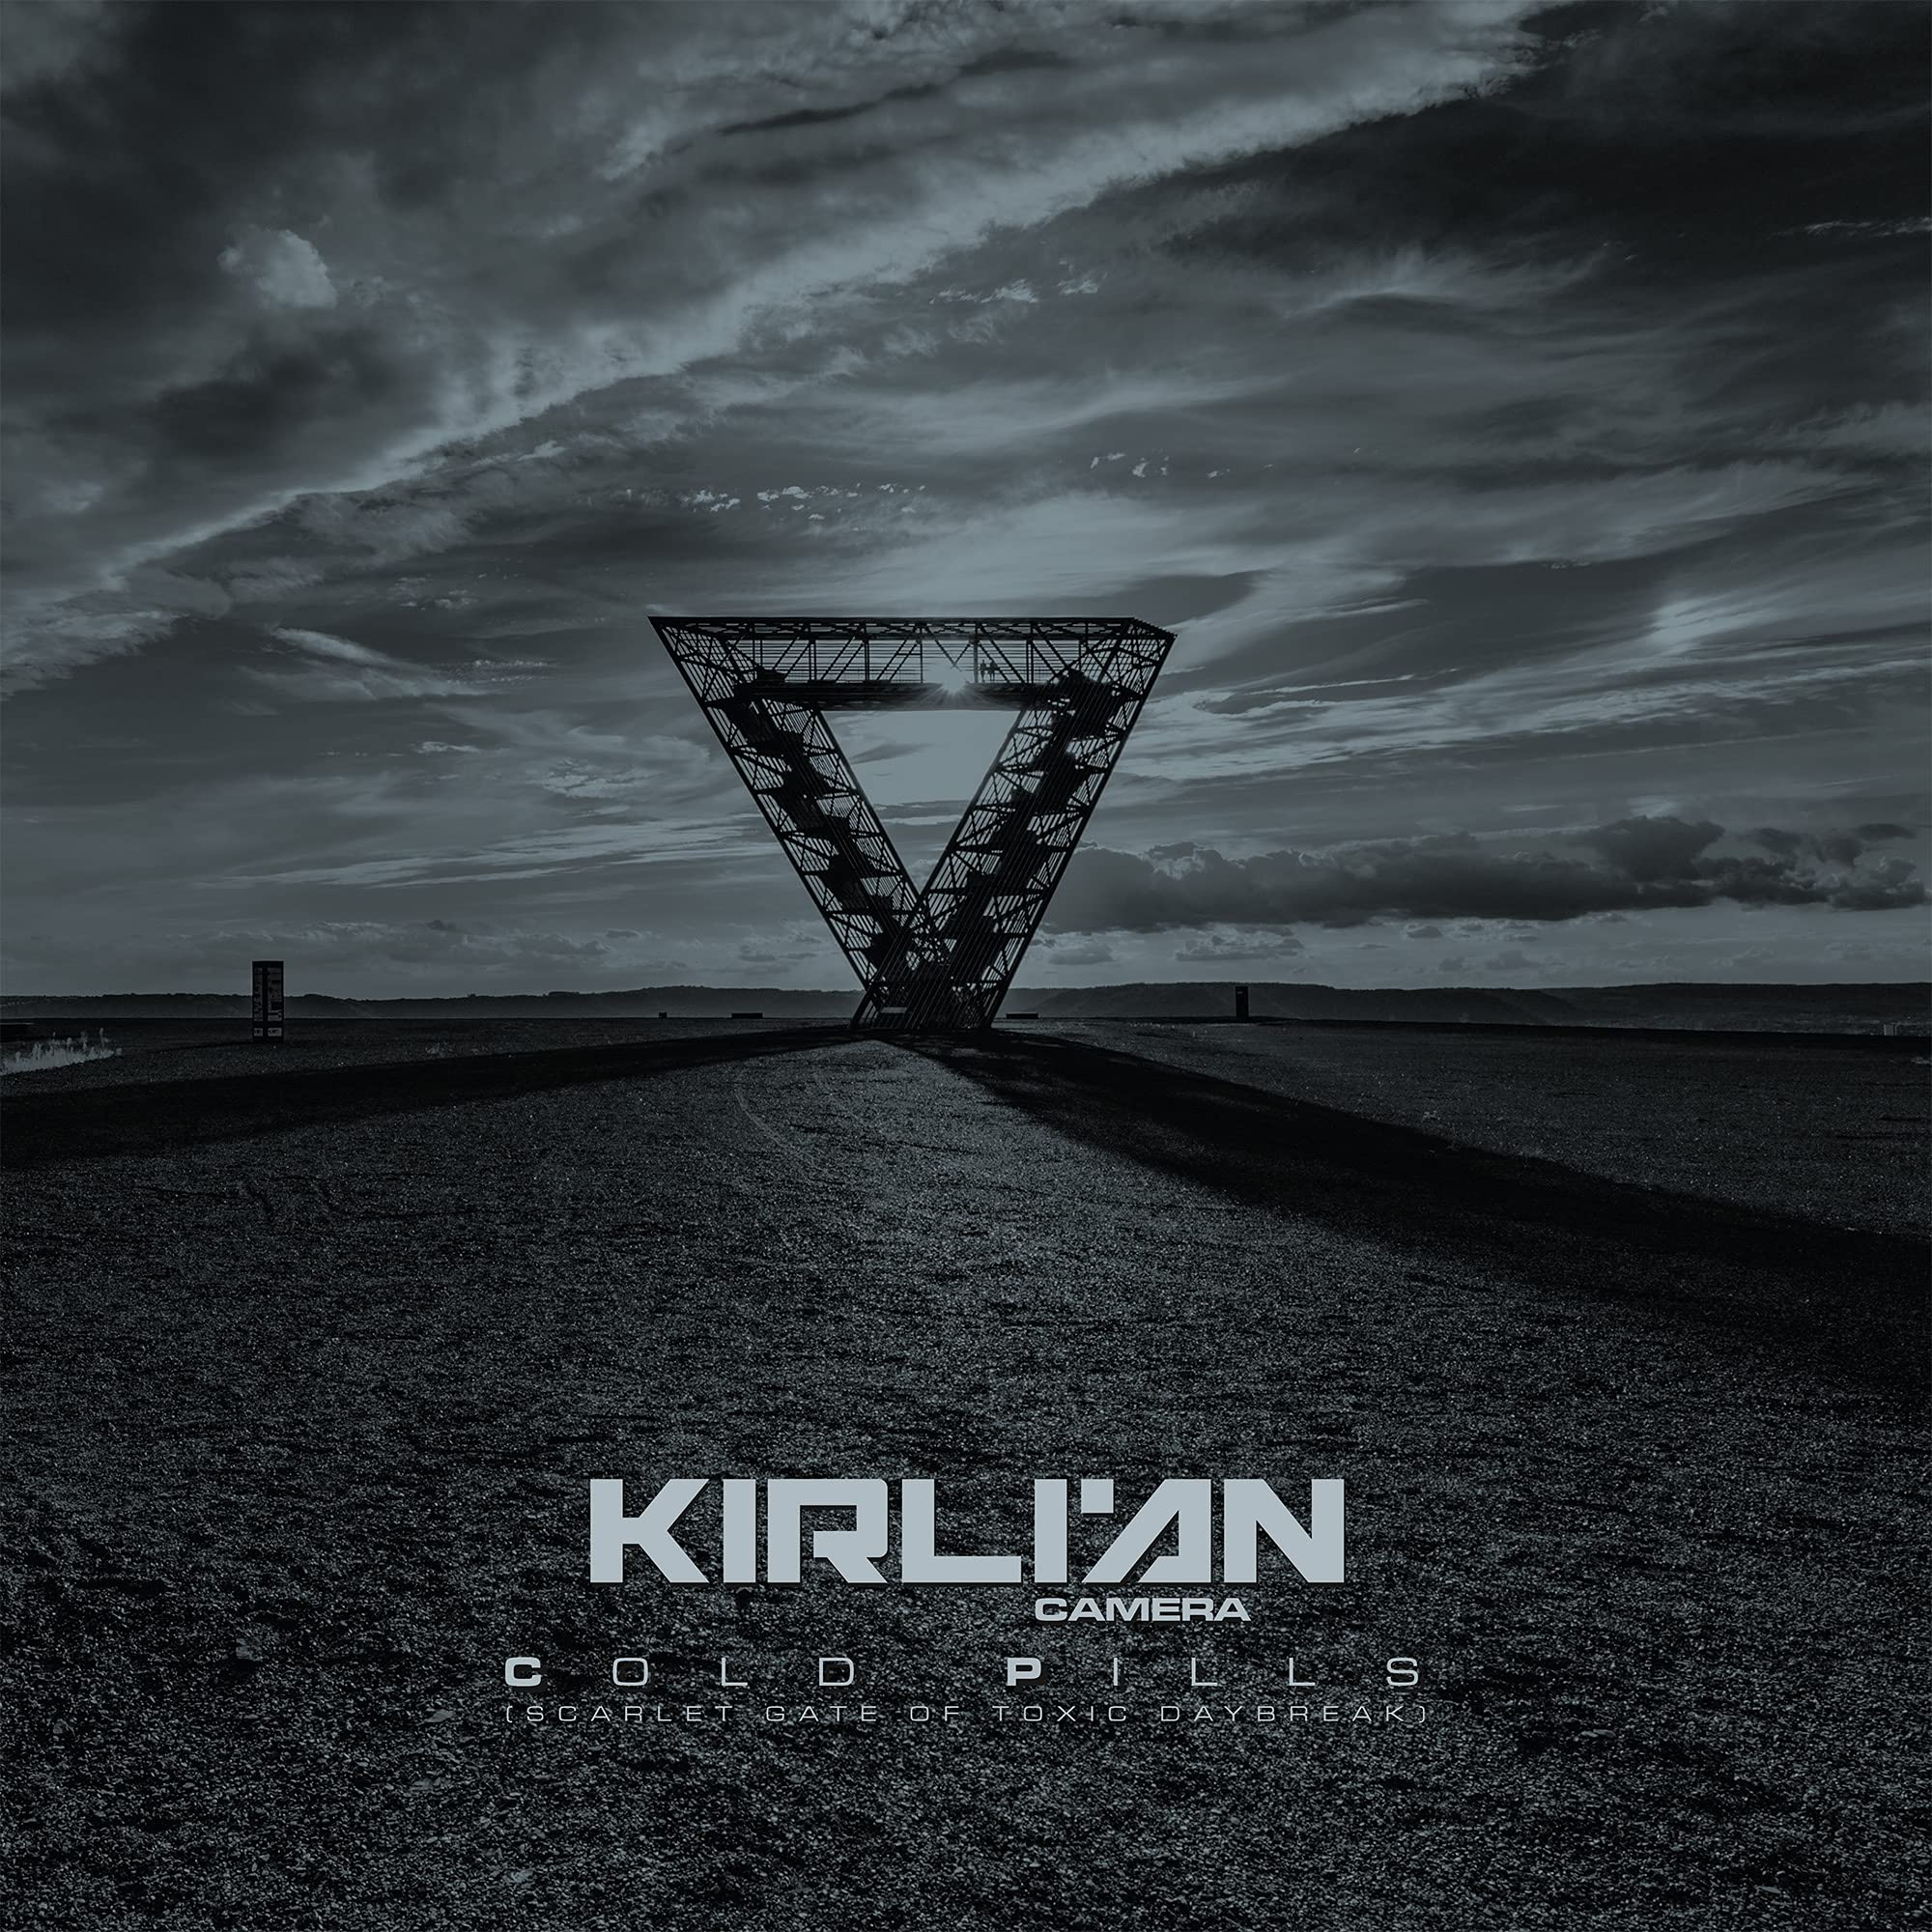 Kirlian Camera - Cold Pills (Scarlet Gate of Toxic Daybreak) (2021) [FLAC] Download